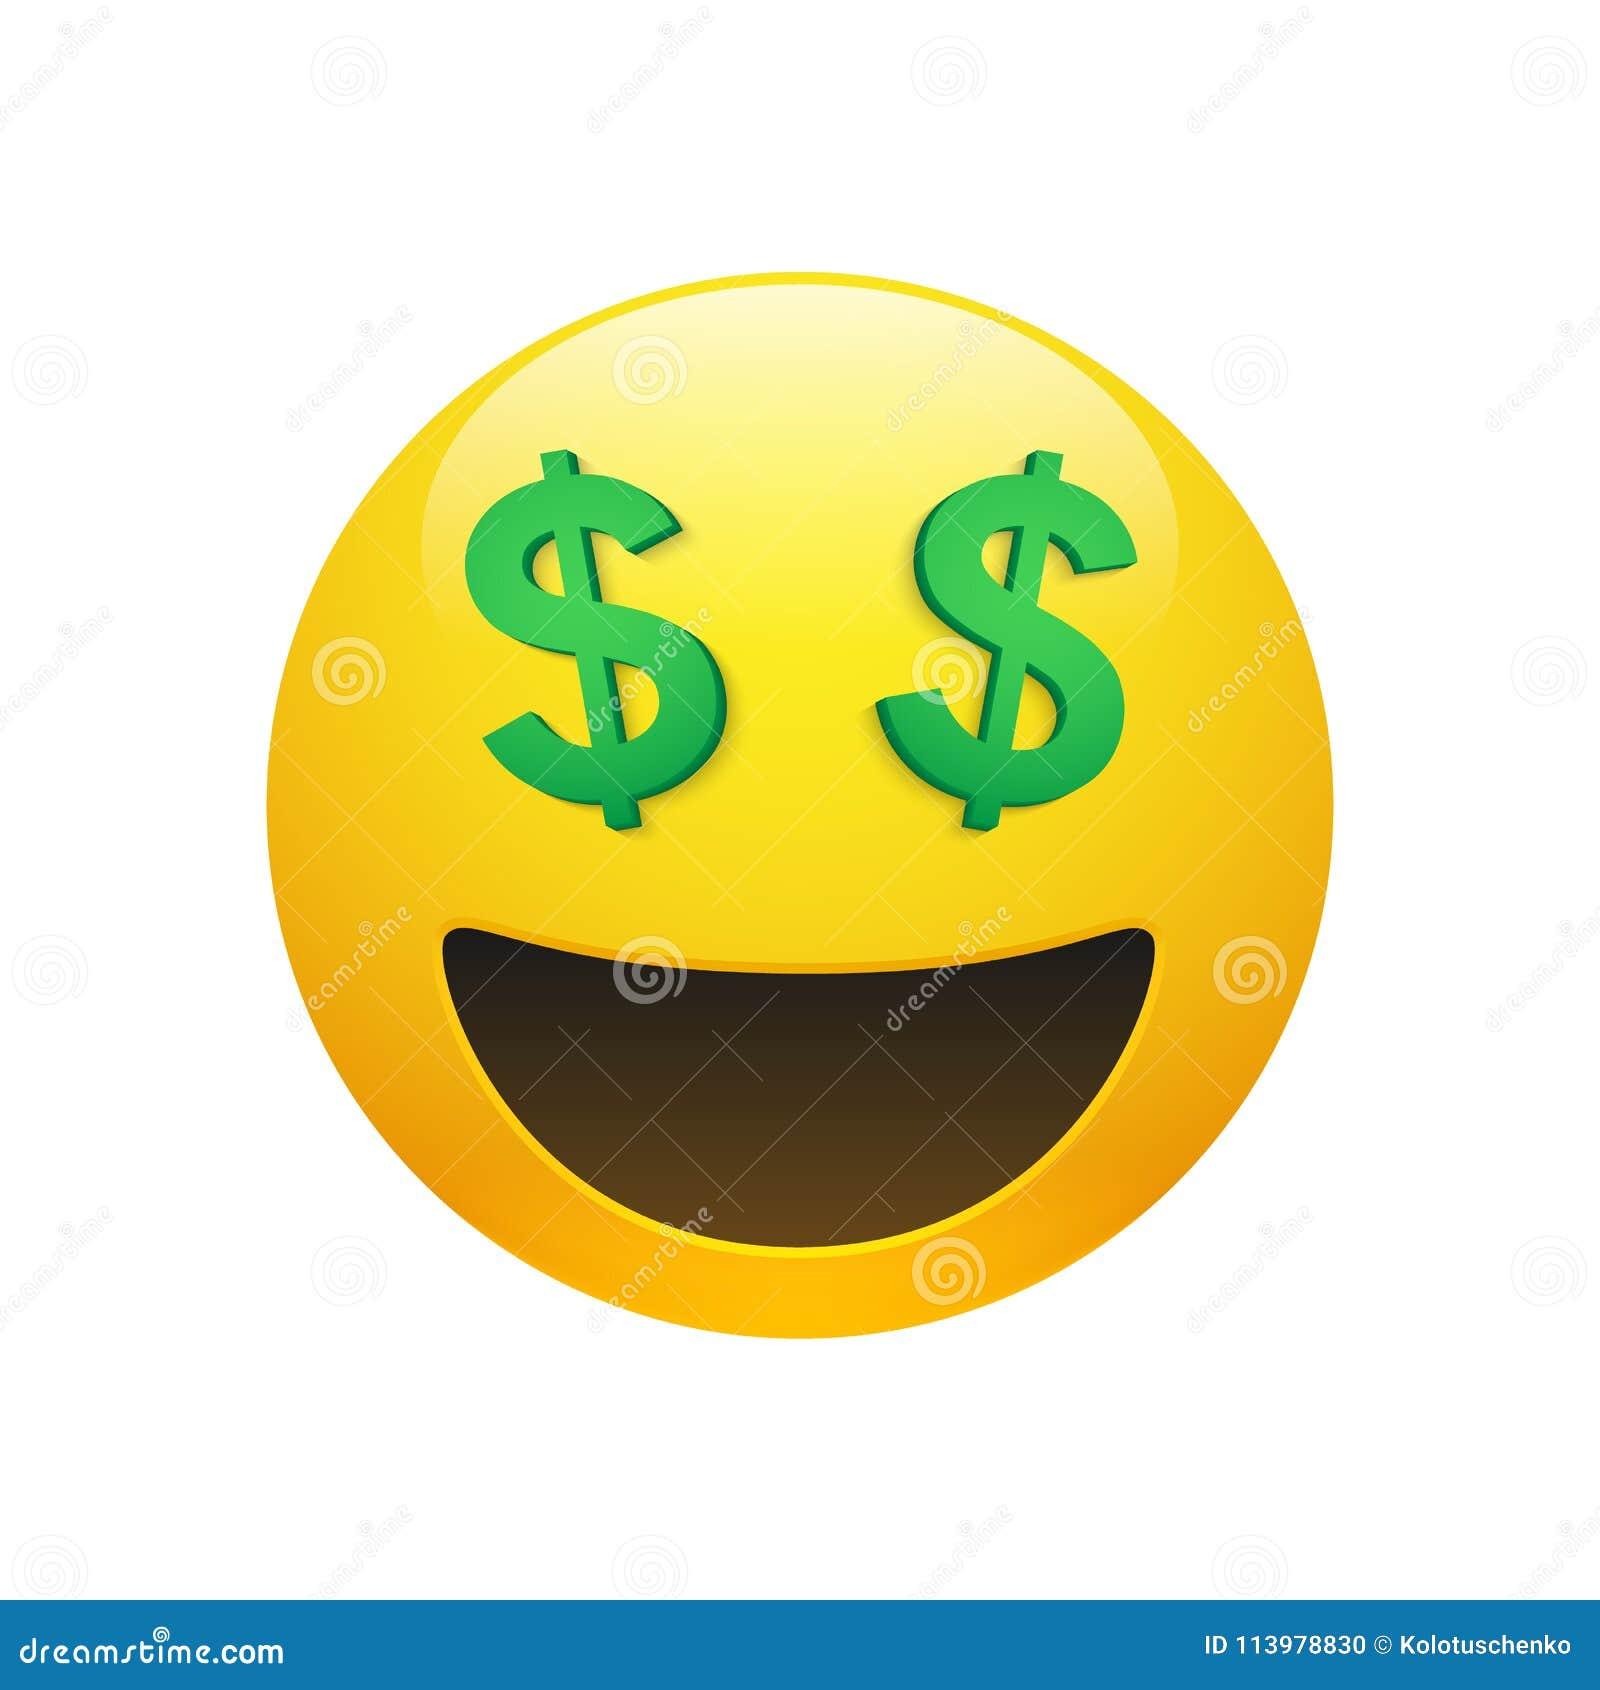 Emoji Yellow Smiley Face With Dollar Symbol Eyes Stock Vector